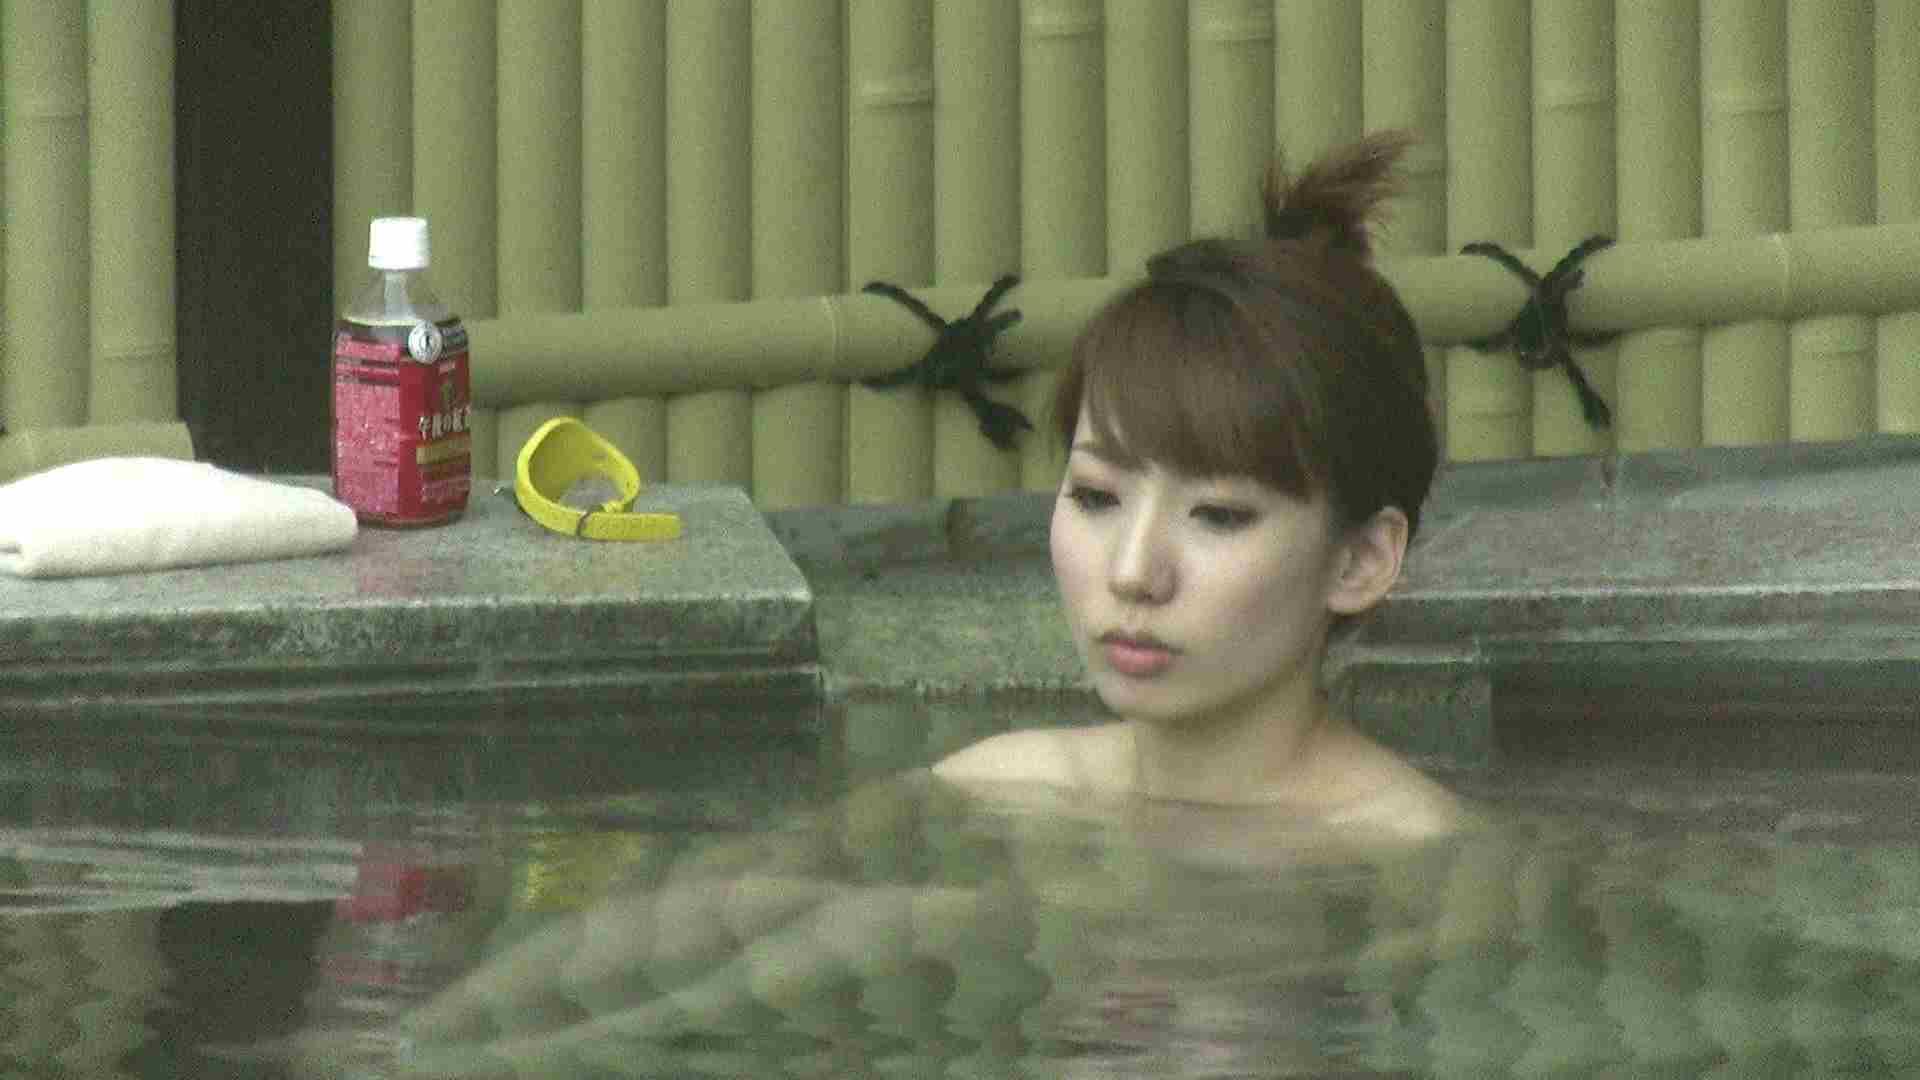 Aquaな露天風呂Vol.208 OLセックス  85画像 24